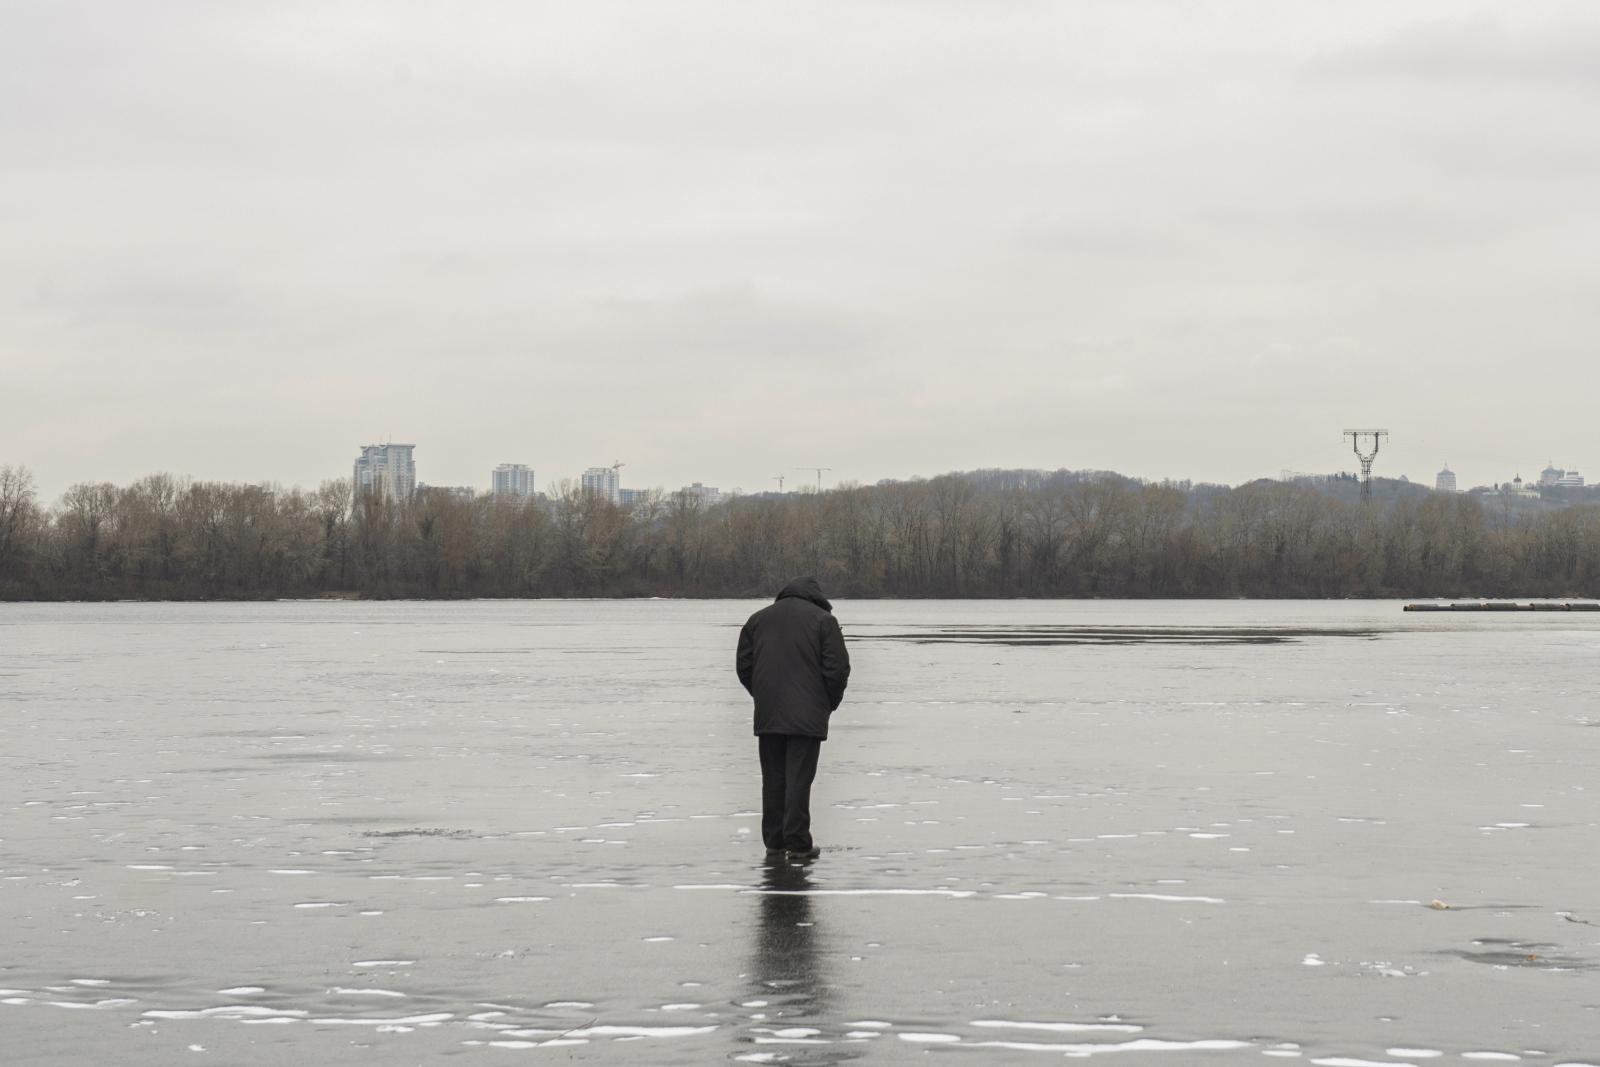 Art and Documentary Photography - Loading Seeking_ice_anglers21.jpg